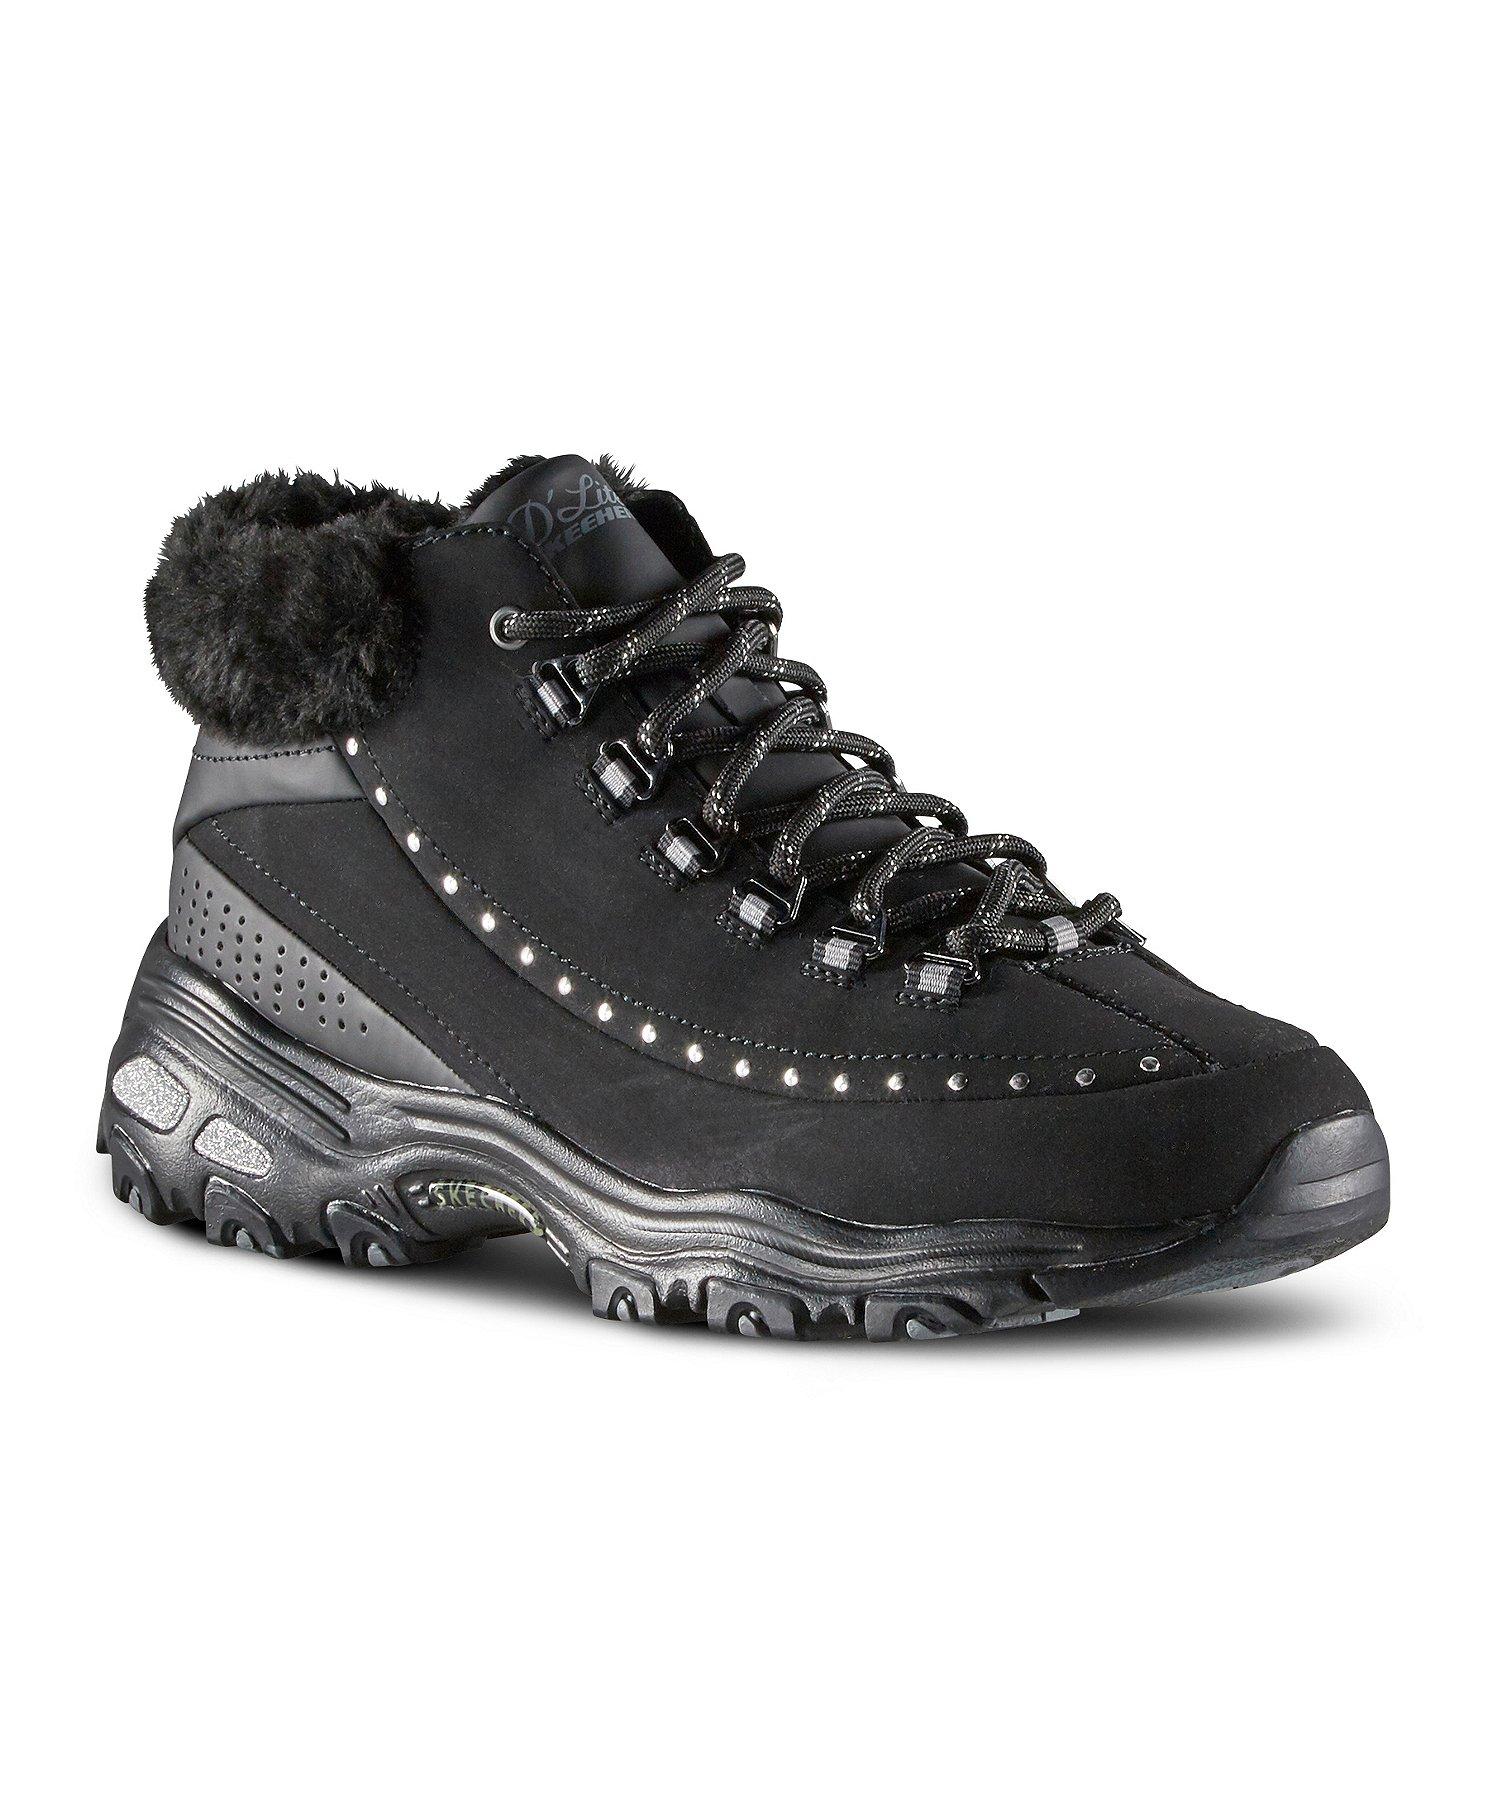 Magnético apodo muerte  Women's D'Lites Gleeful Boots - Black | Mark's